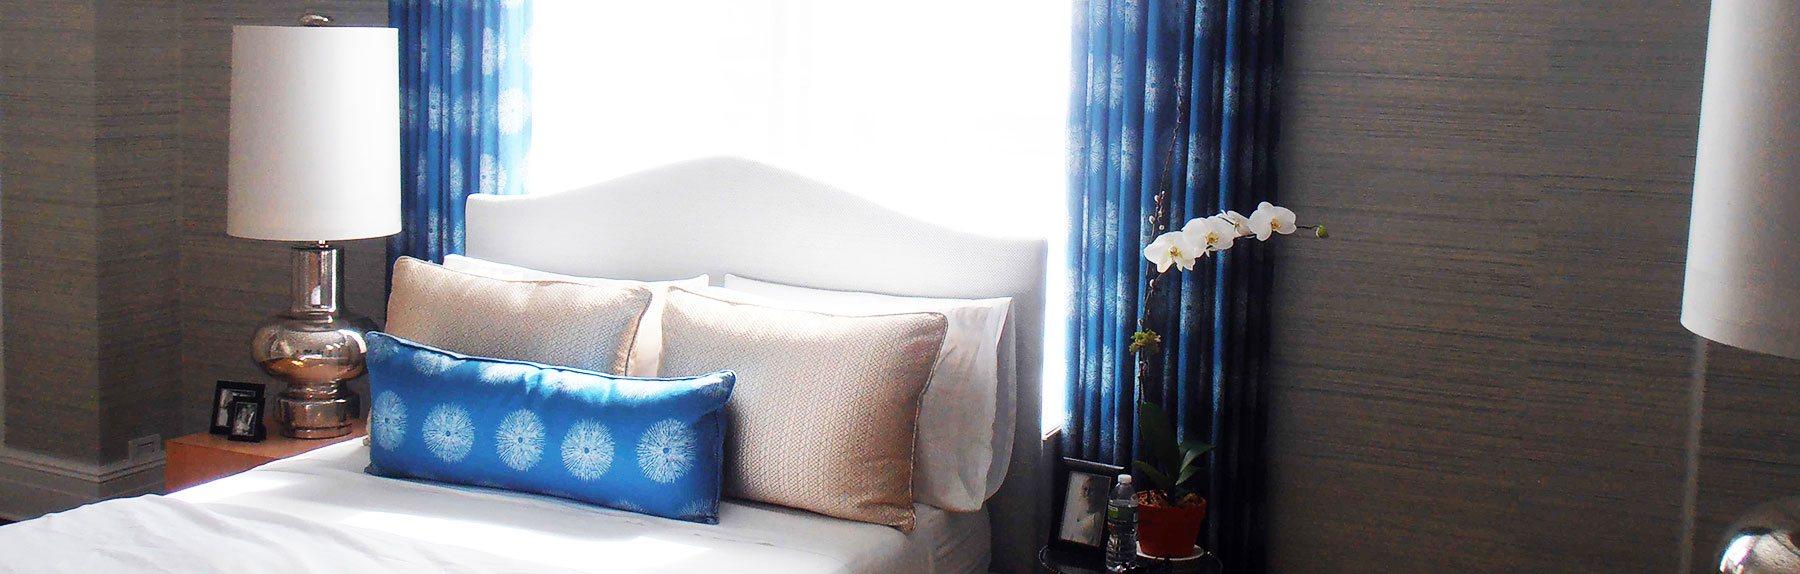 Window-treatment-new-york-dreams-upholstery